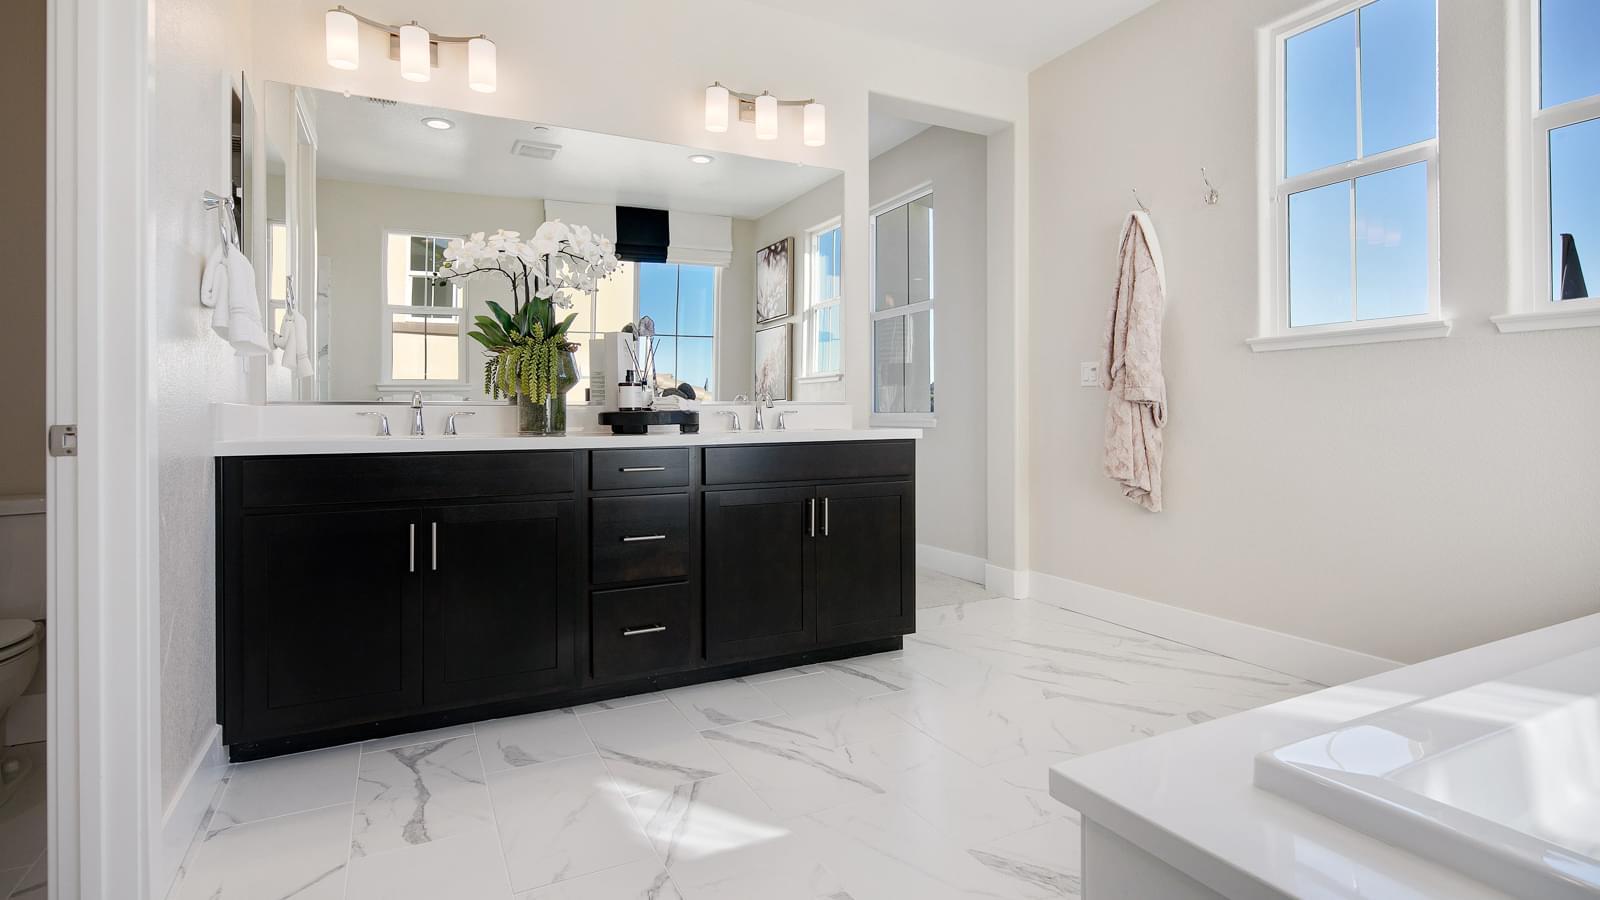 Residence 1 Master Bath